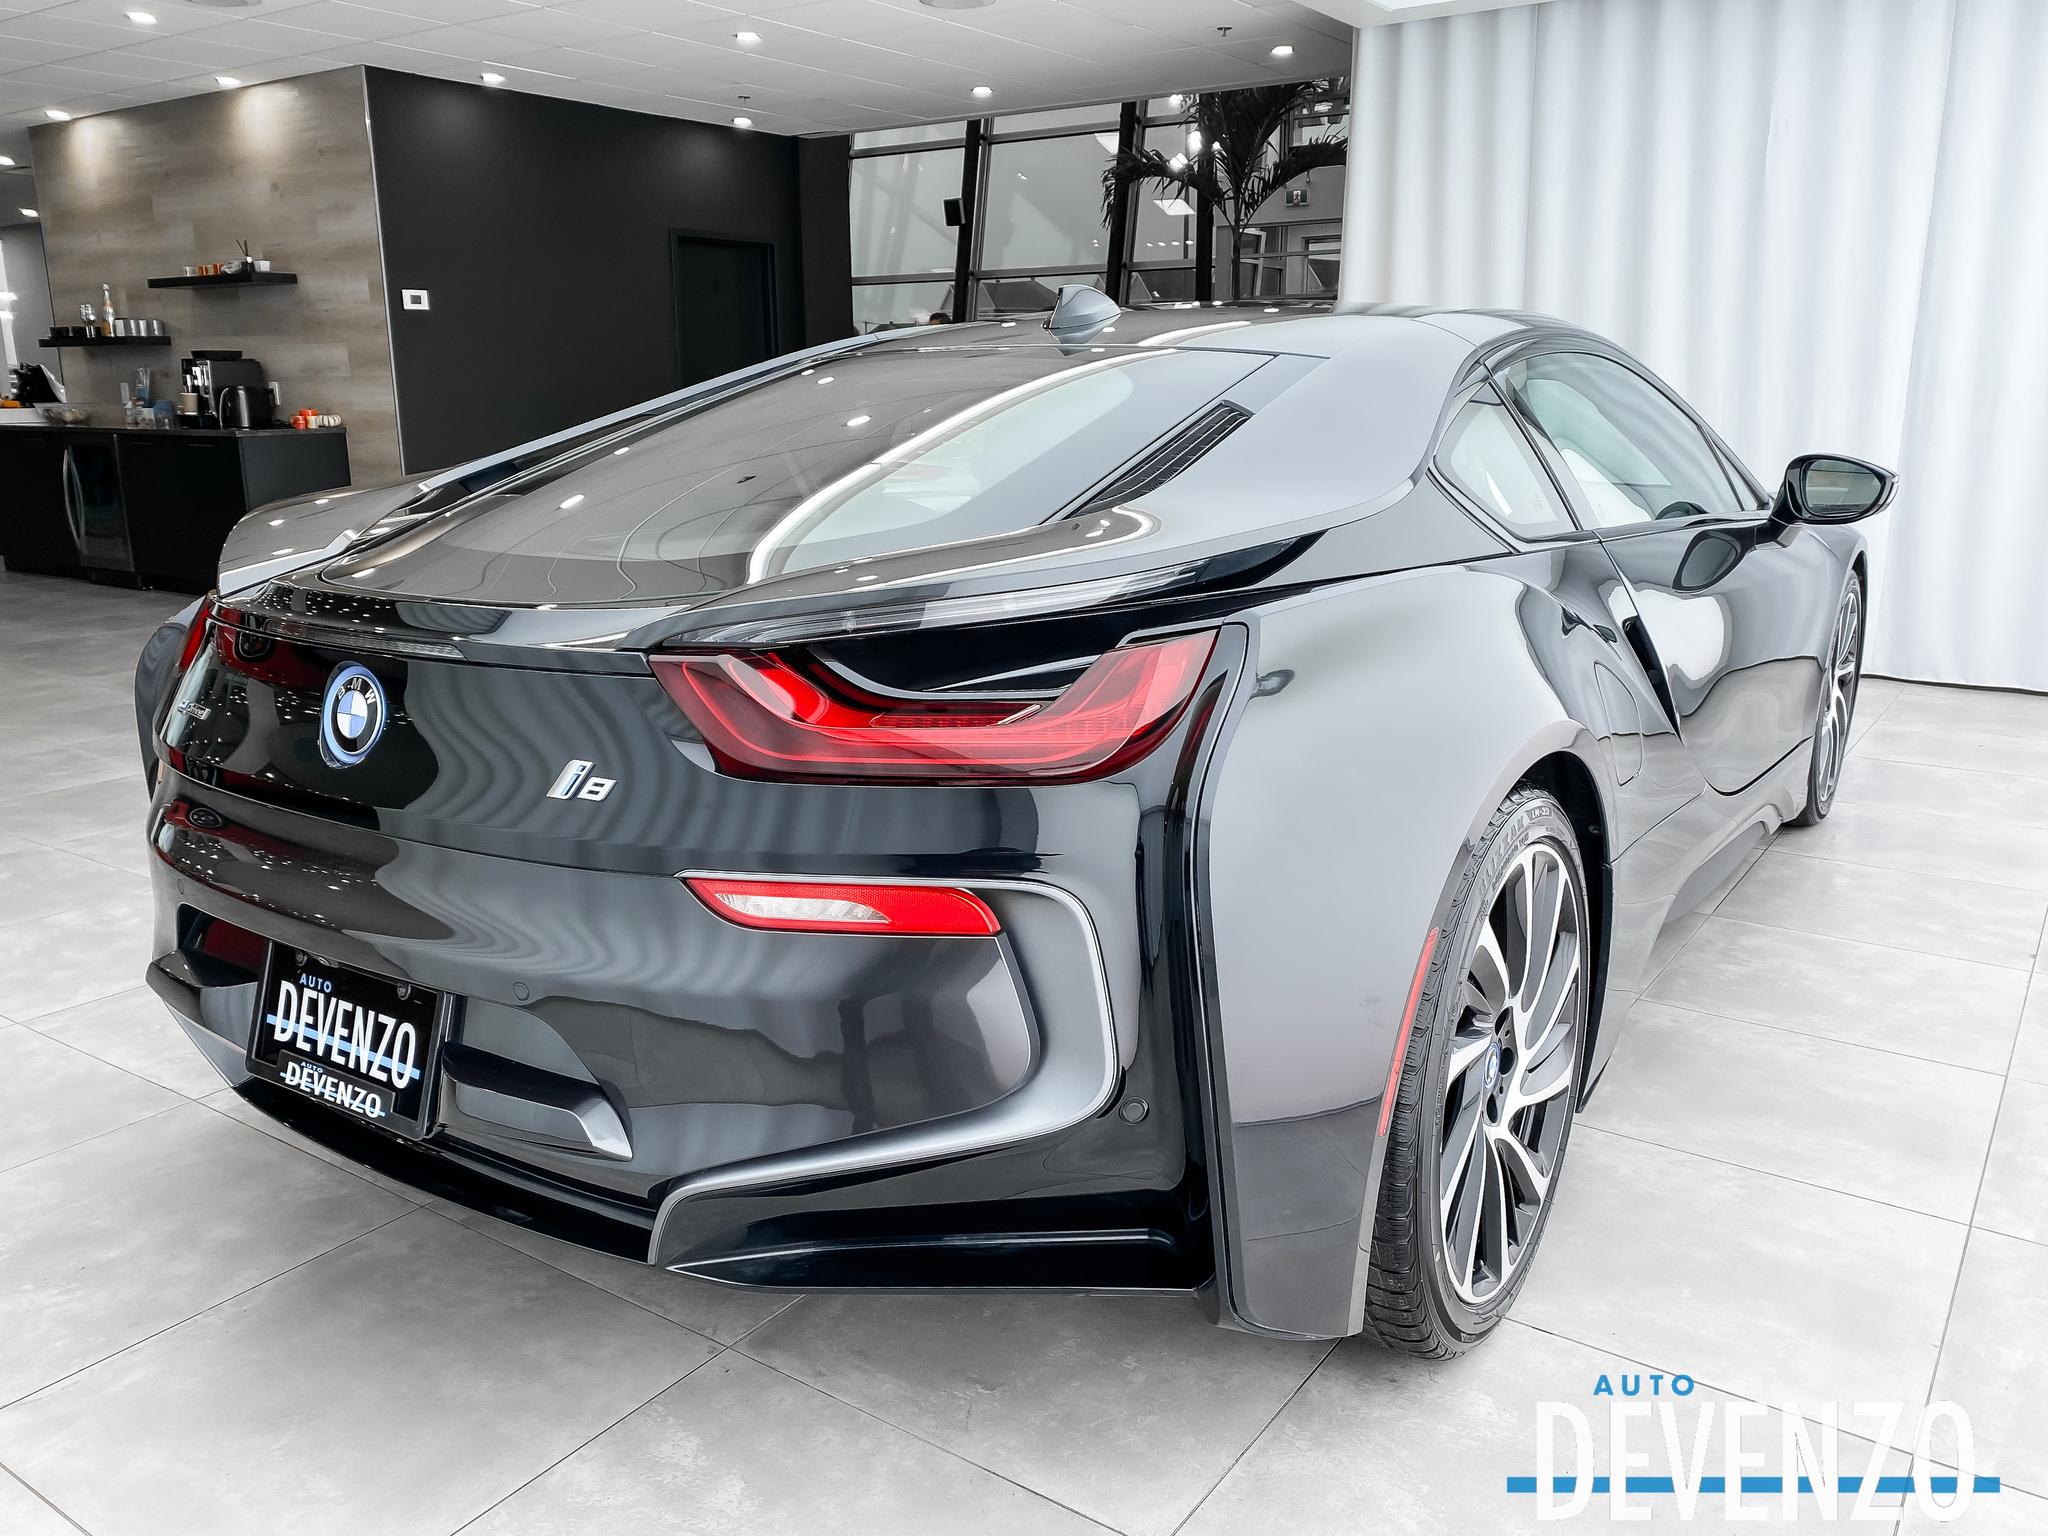 2016 BMW i8 SOPHISTO GREY / HALO INTERIOR WORLD complet